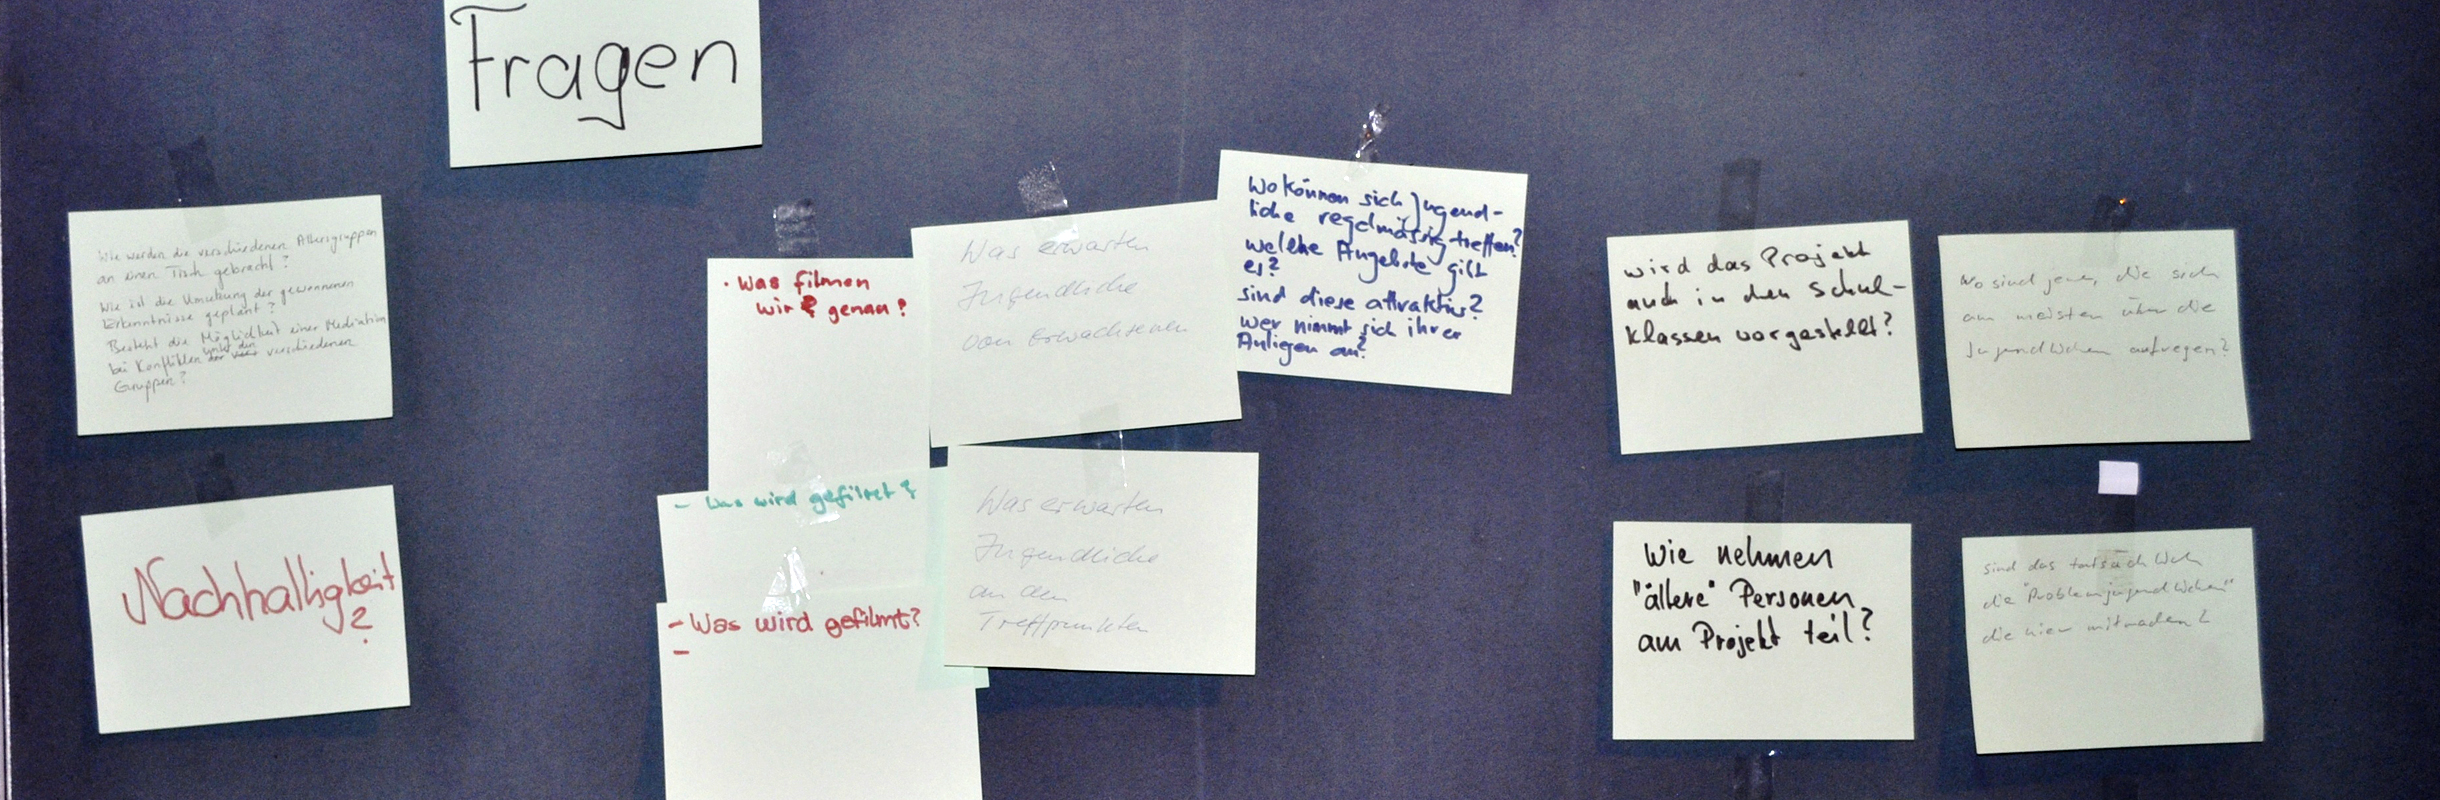 Peopletalk-Lenzburg Infoveranstaltung